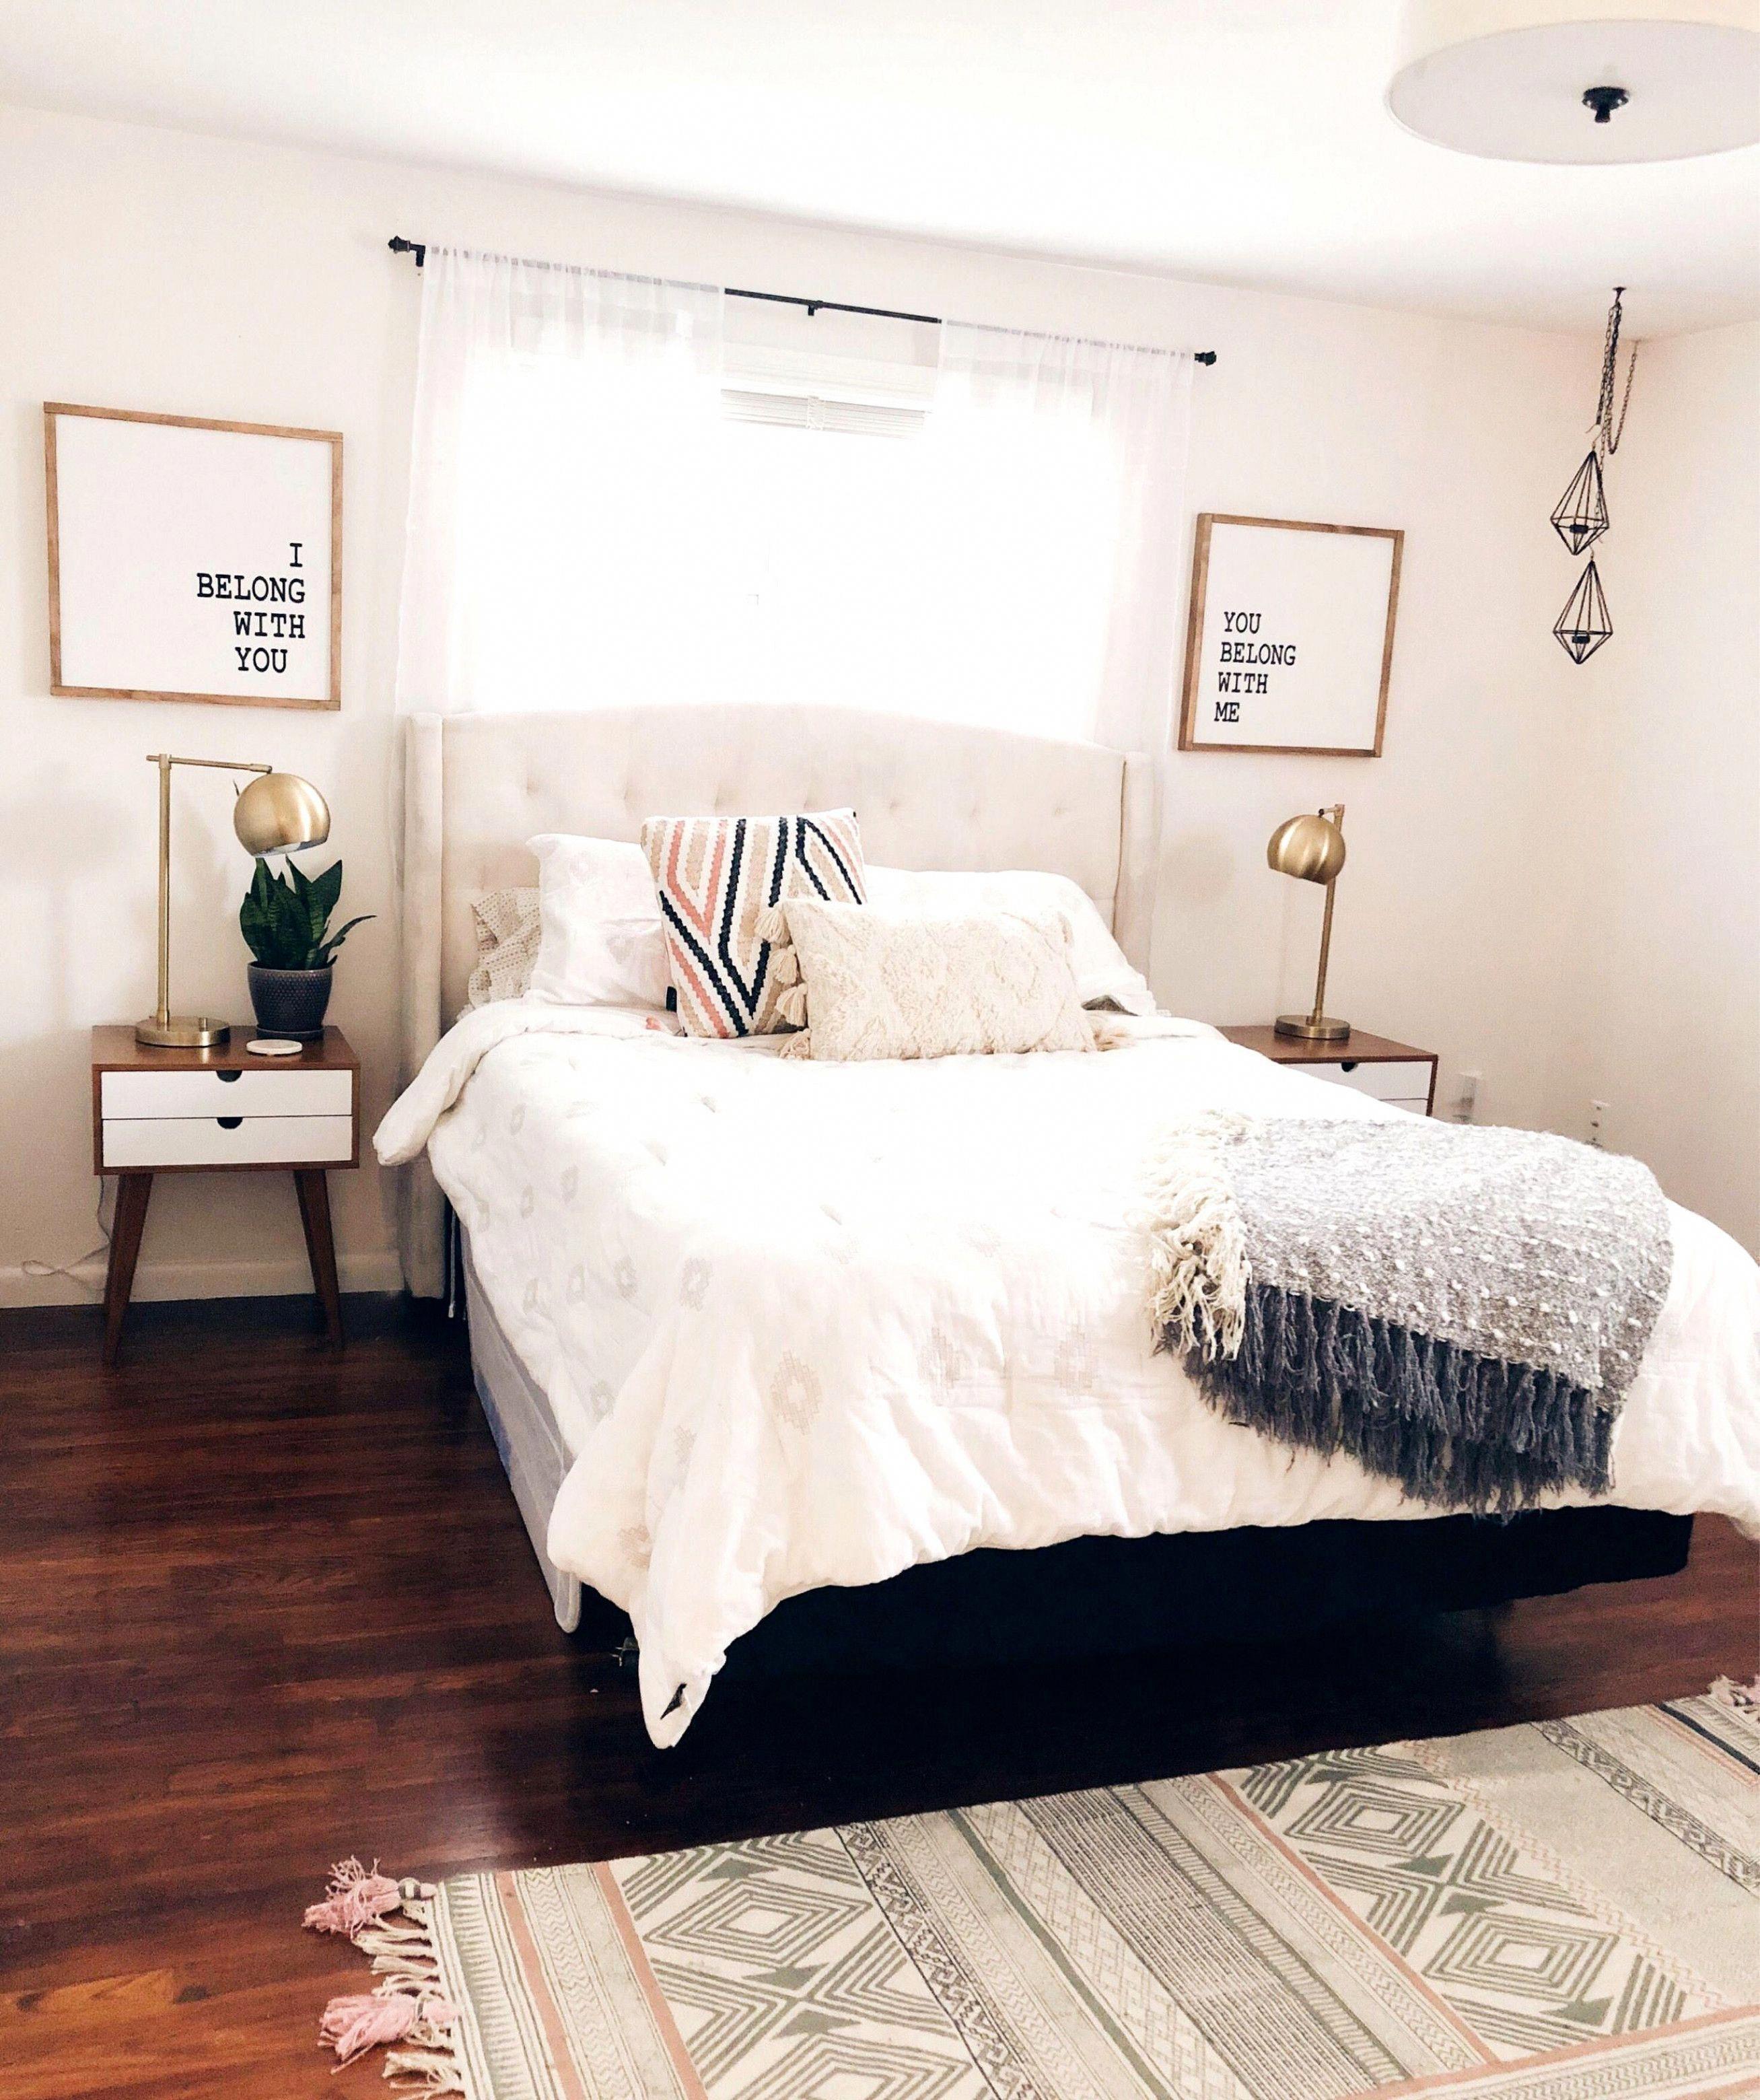 minimalistbedroom homedecordiybedroom my diy home decor ideas rh pinterest com